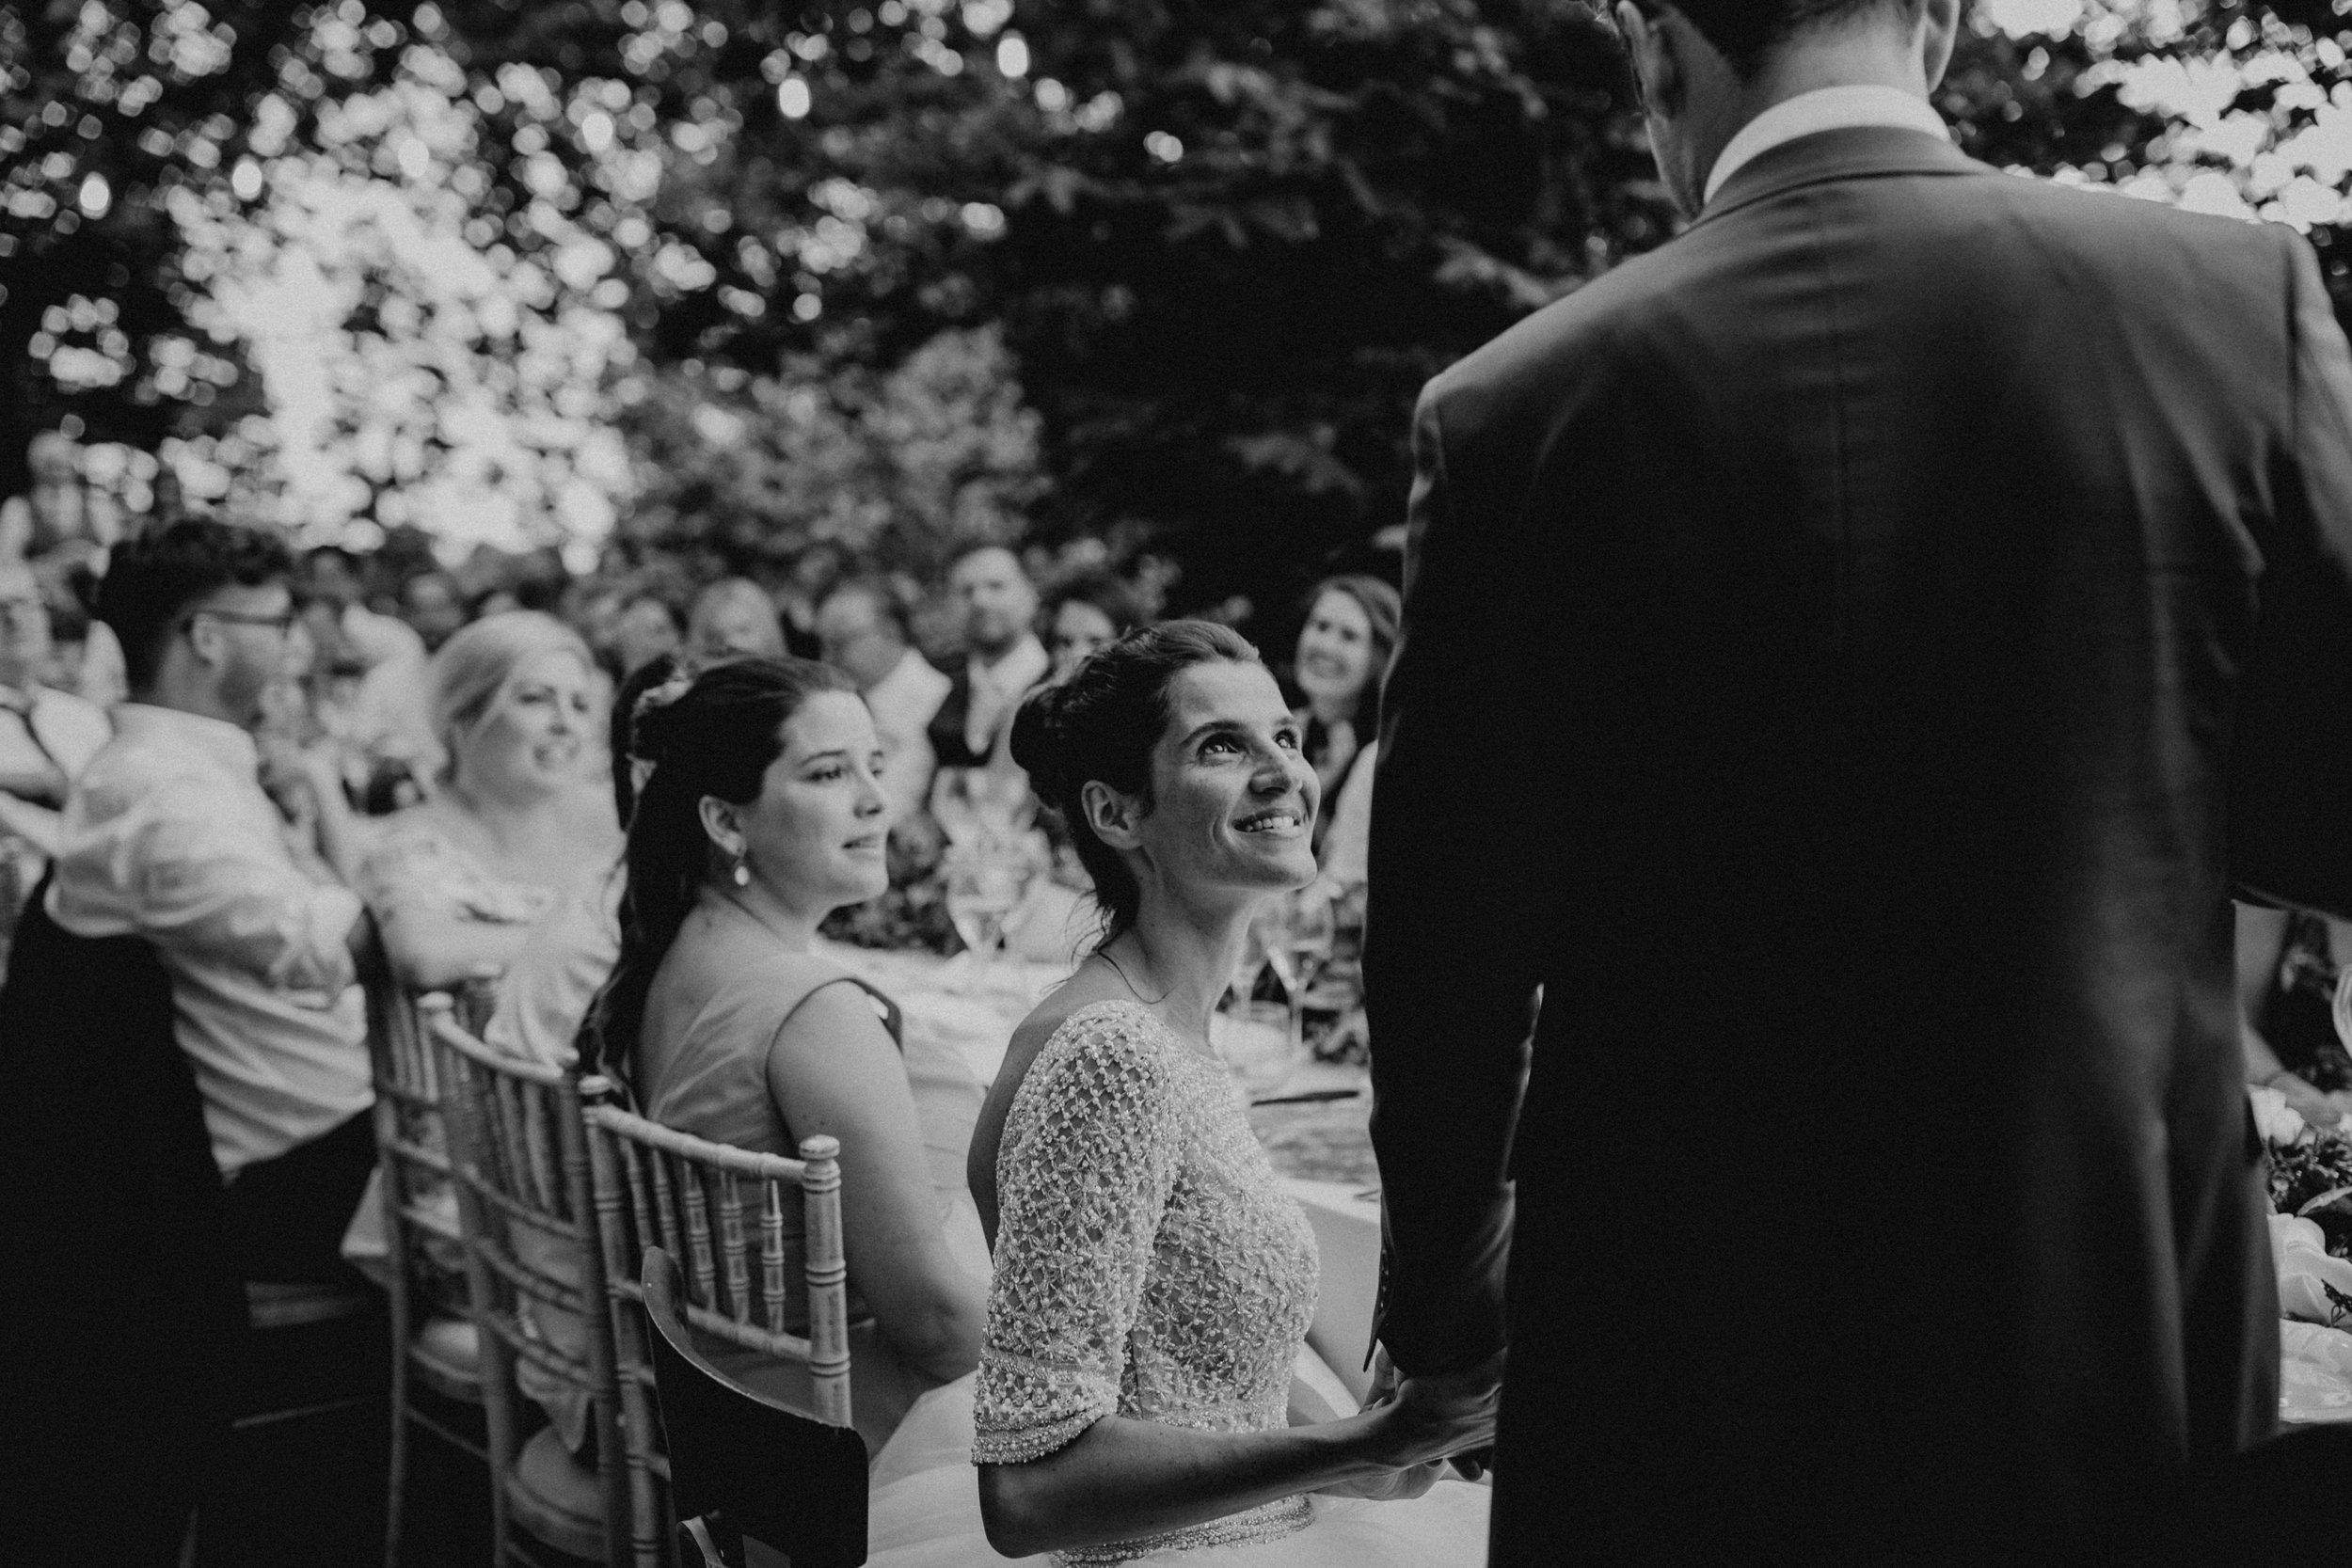 Lapela-photography-wedding-sintra-portugal-116.jpg